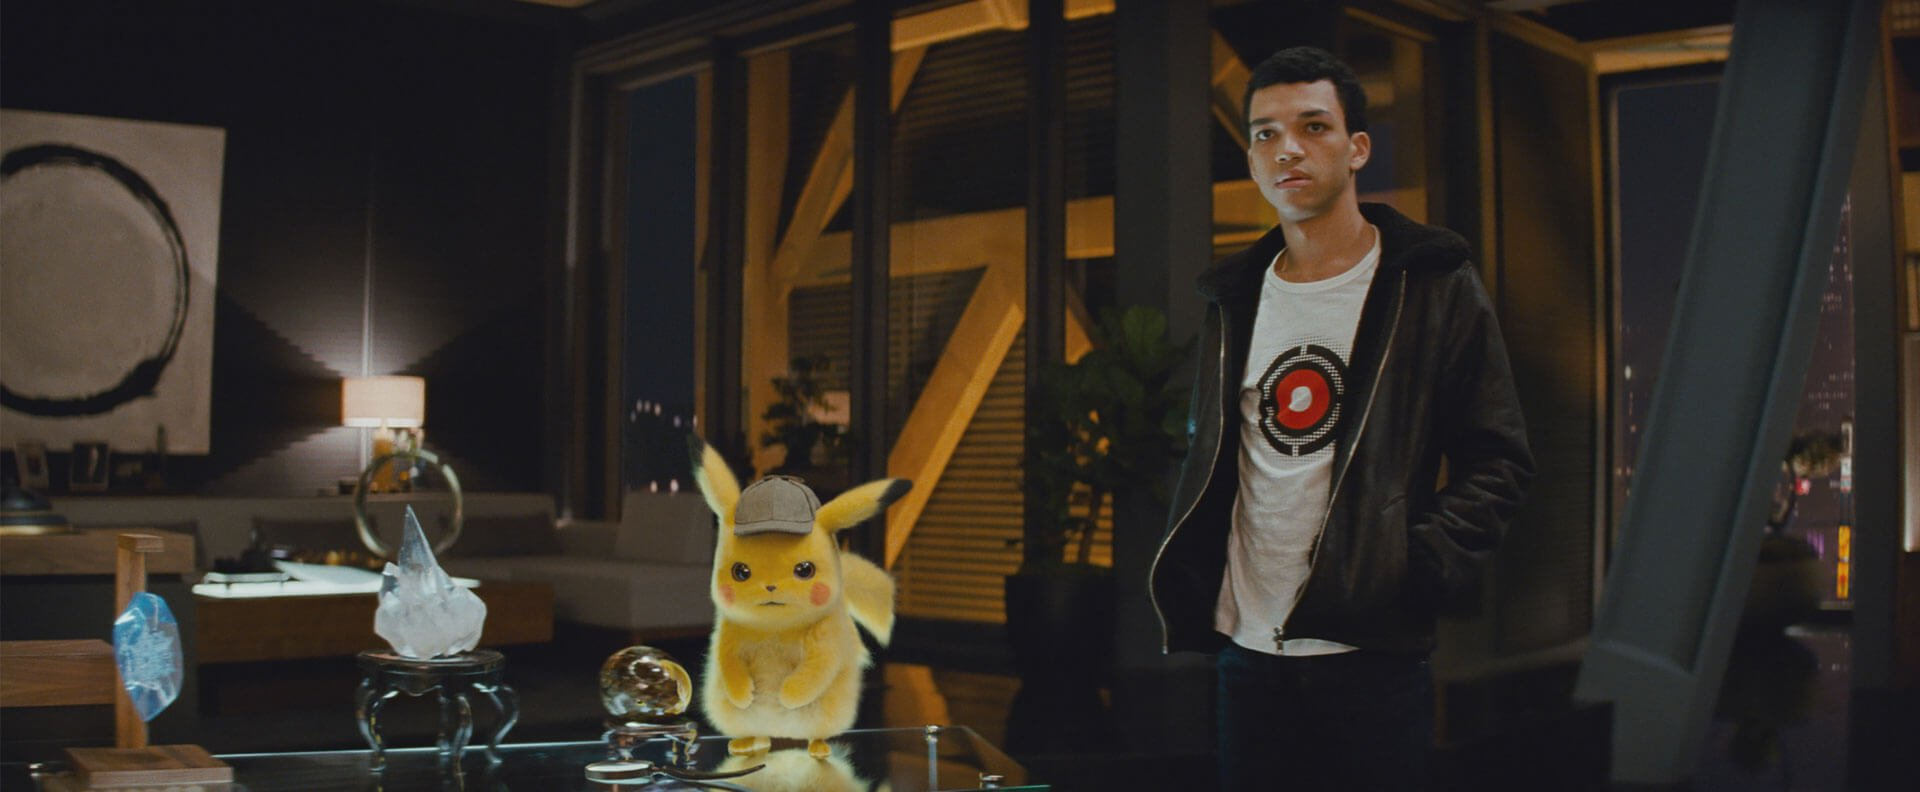 Покемон детектив Пікачу / Pokémon Detective Pikachu (2019)